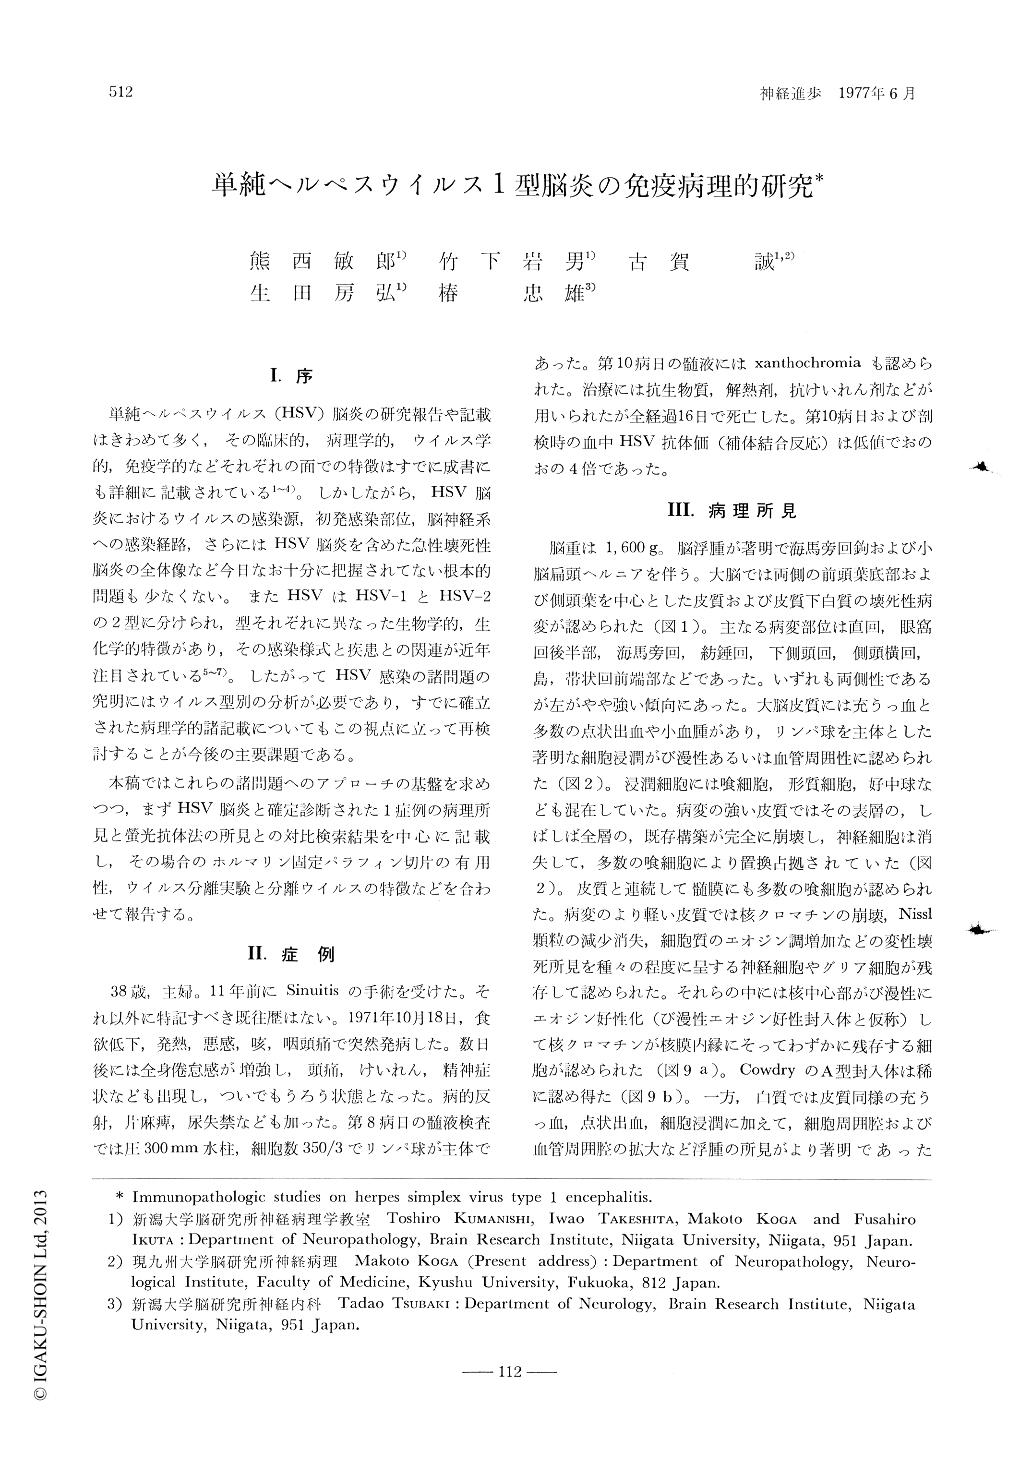 Shinkei Kenkyu no Shinpo                                                                                                                              Volume 21, Issue 3                                                                                                                            (June 1977)                                                                                                                                                                                                    神経研究の進歩                                                                                                                            21巻3号                                                                                                                            (1977年6月)                                                                                                                                                        Japanese                                        English